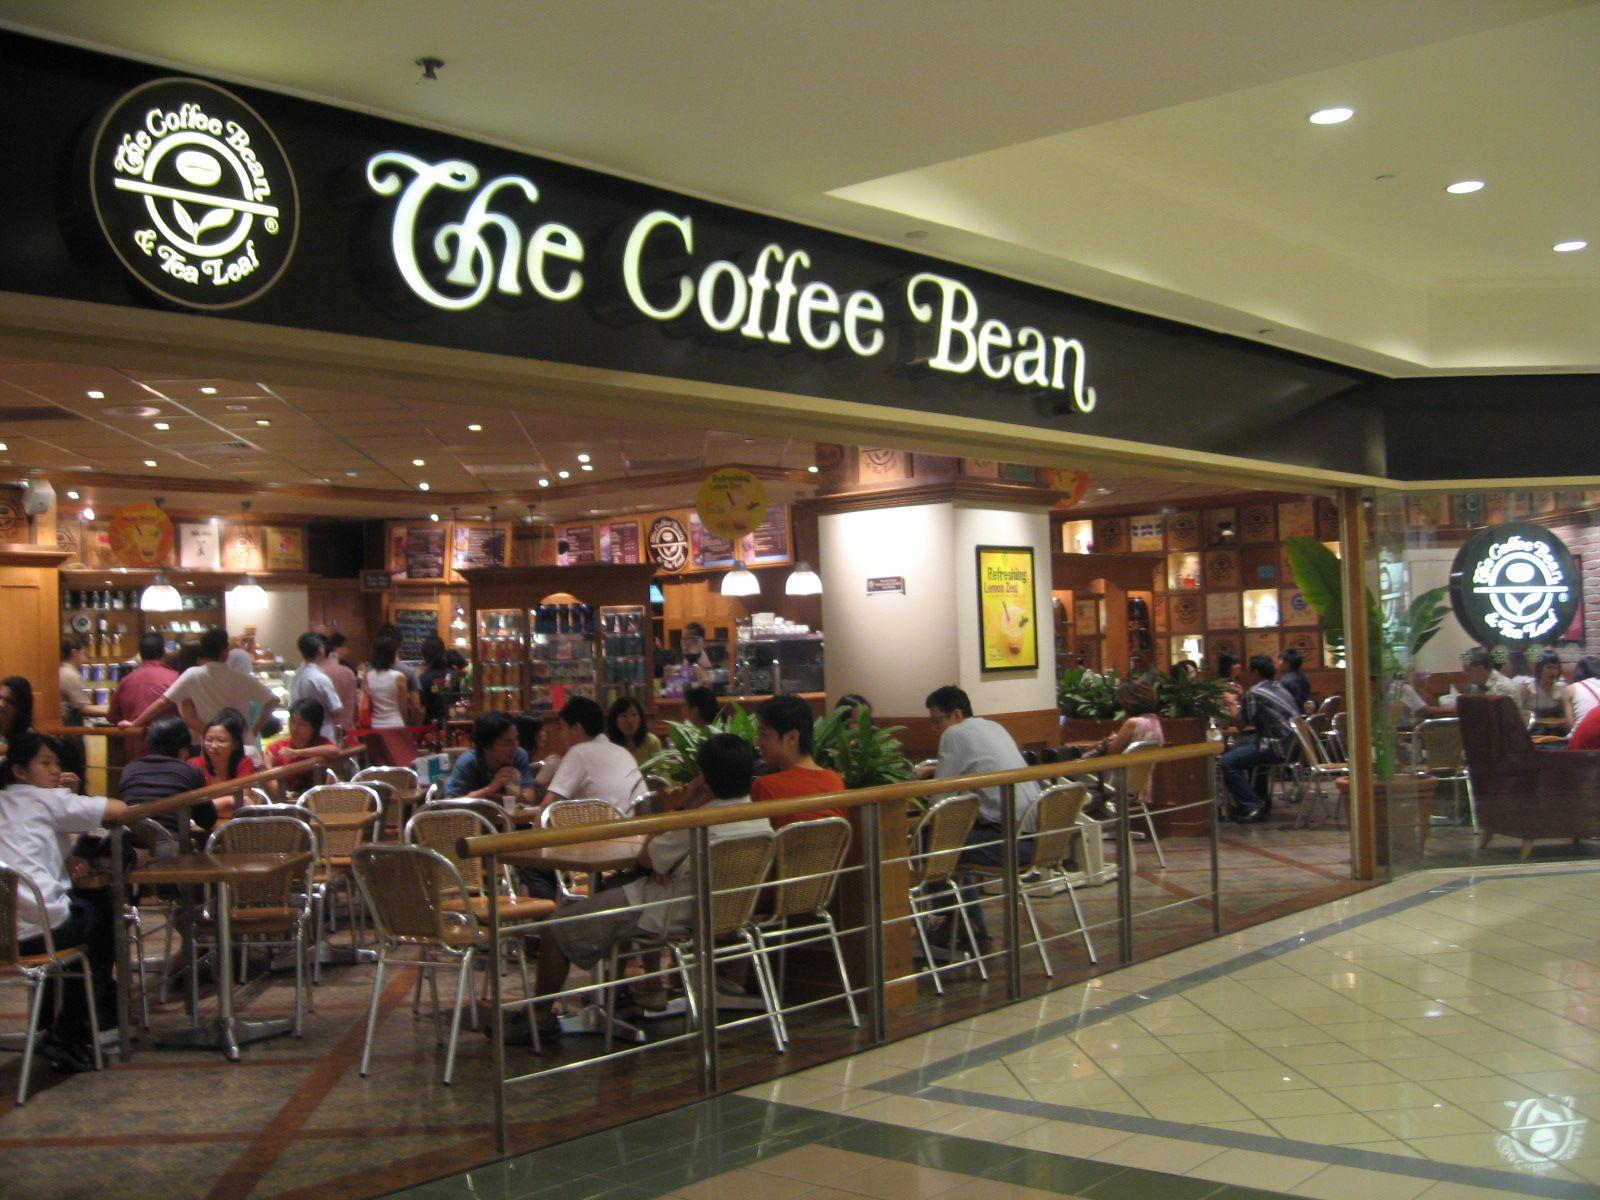 Coffee Bean And Tea Leaf East Los Angeles In 2020 Tea Leaves Coffee Beans Coffee Places